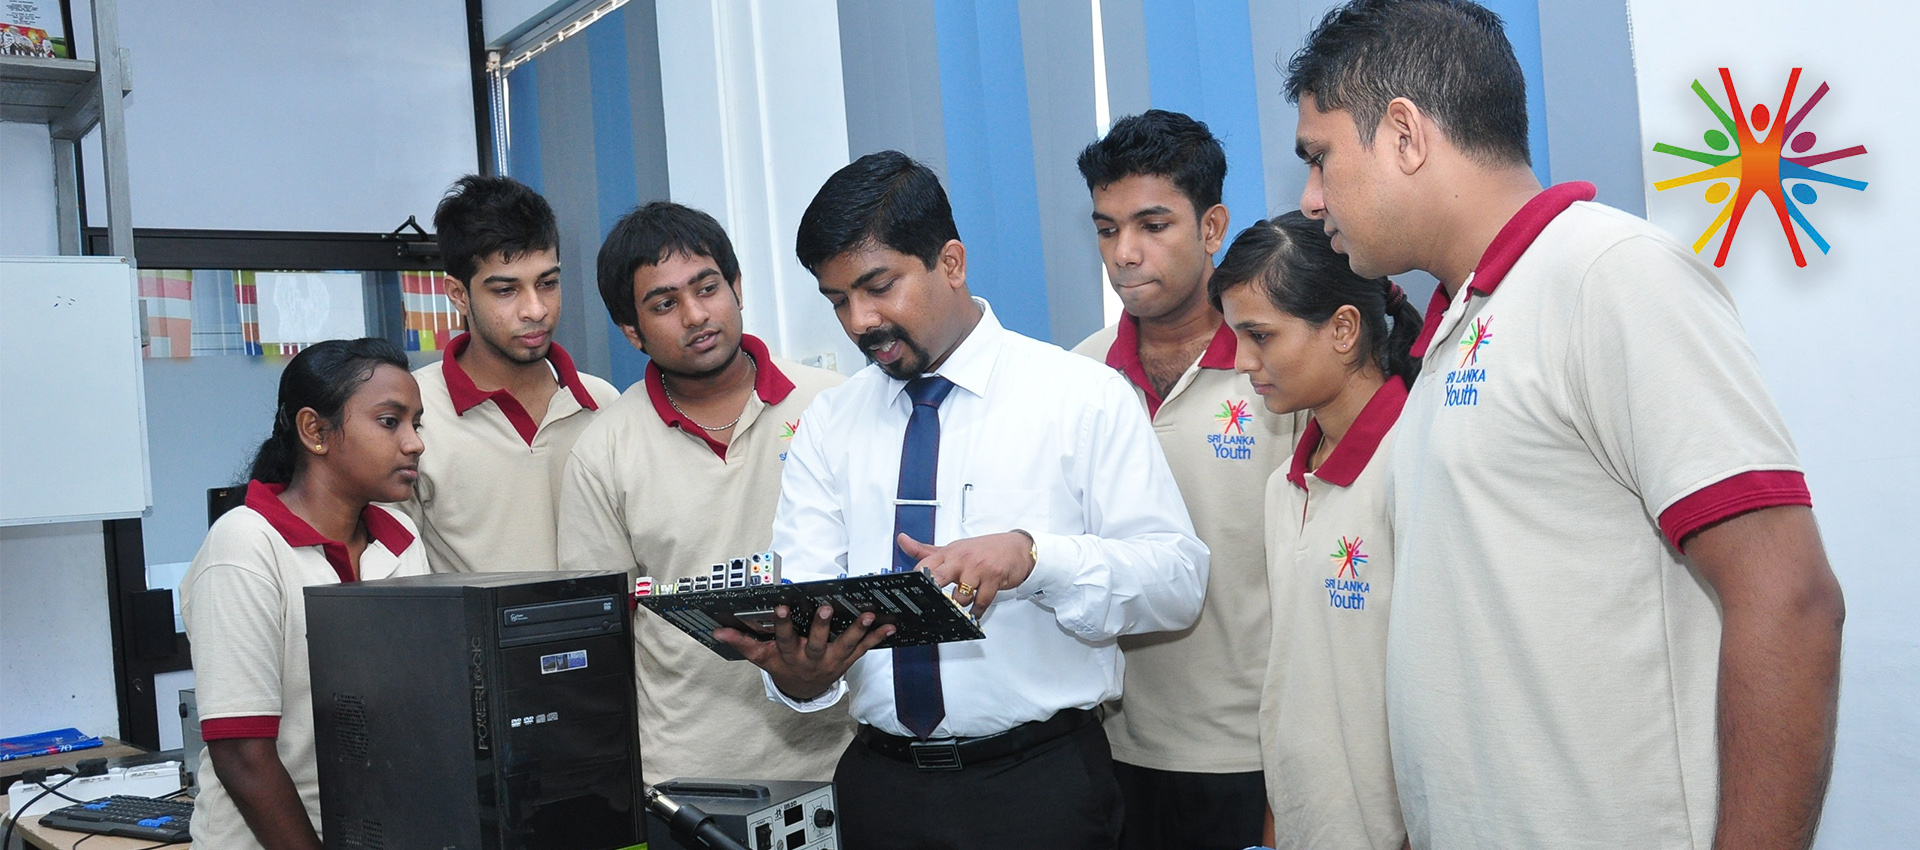 Yesman.lk - Cover Image - Lalith Atulathmudali Vocational Training Center - LAVTC